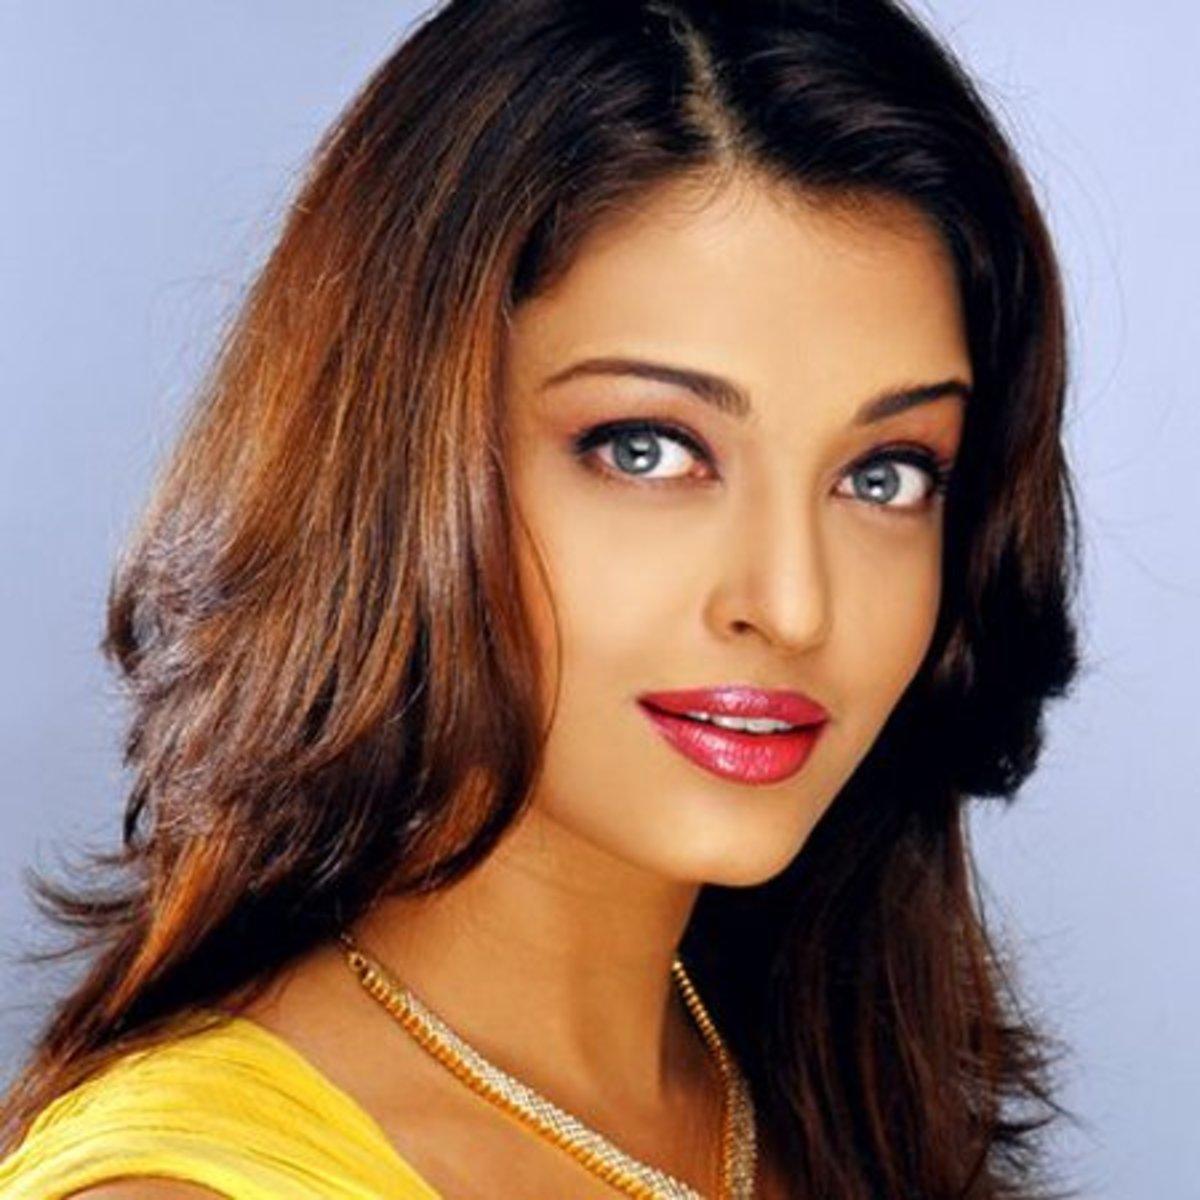 Top 5 English Movies of Aishwarya Rai Bachchan